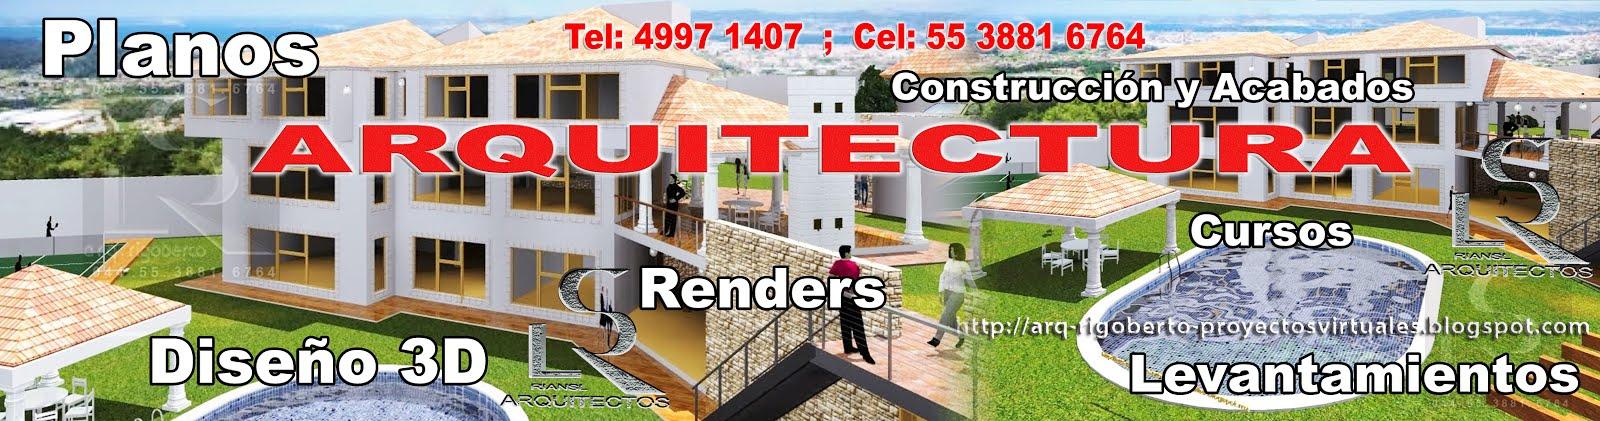 Planos Arquitectónicos de Casa Habitación con calidad profesional riansl.arquitectos